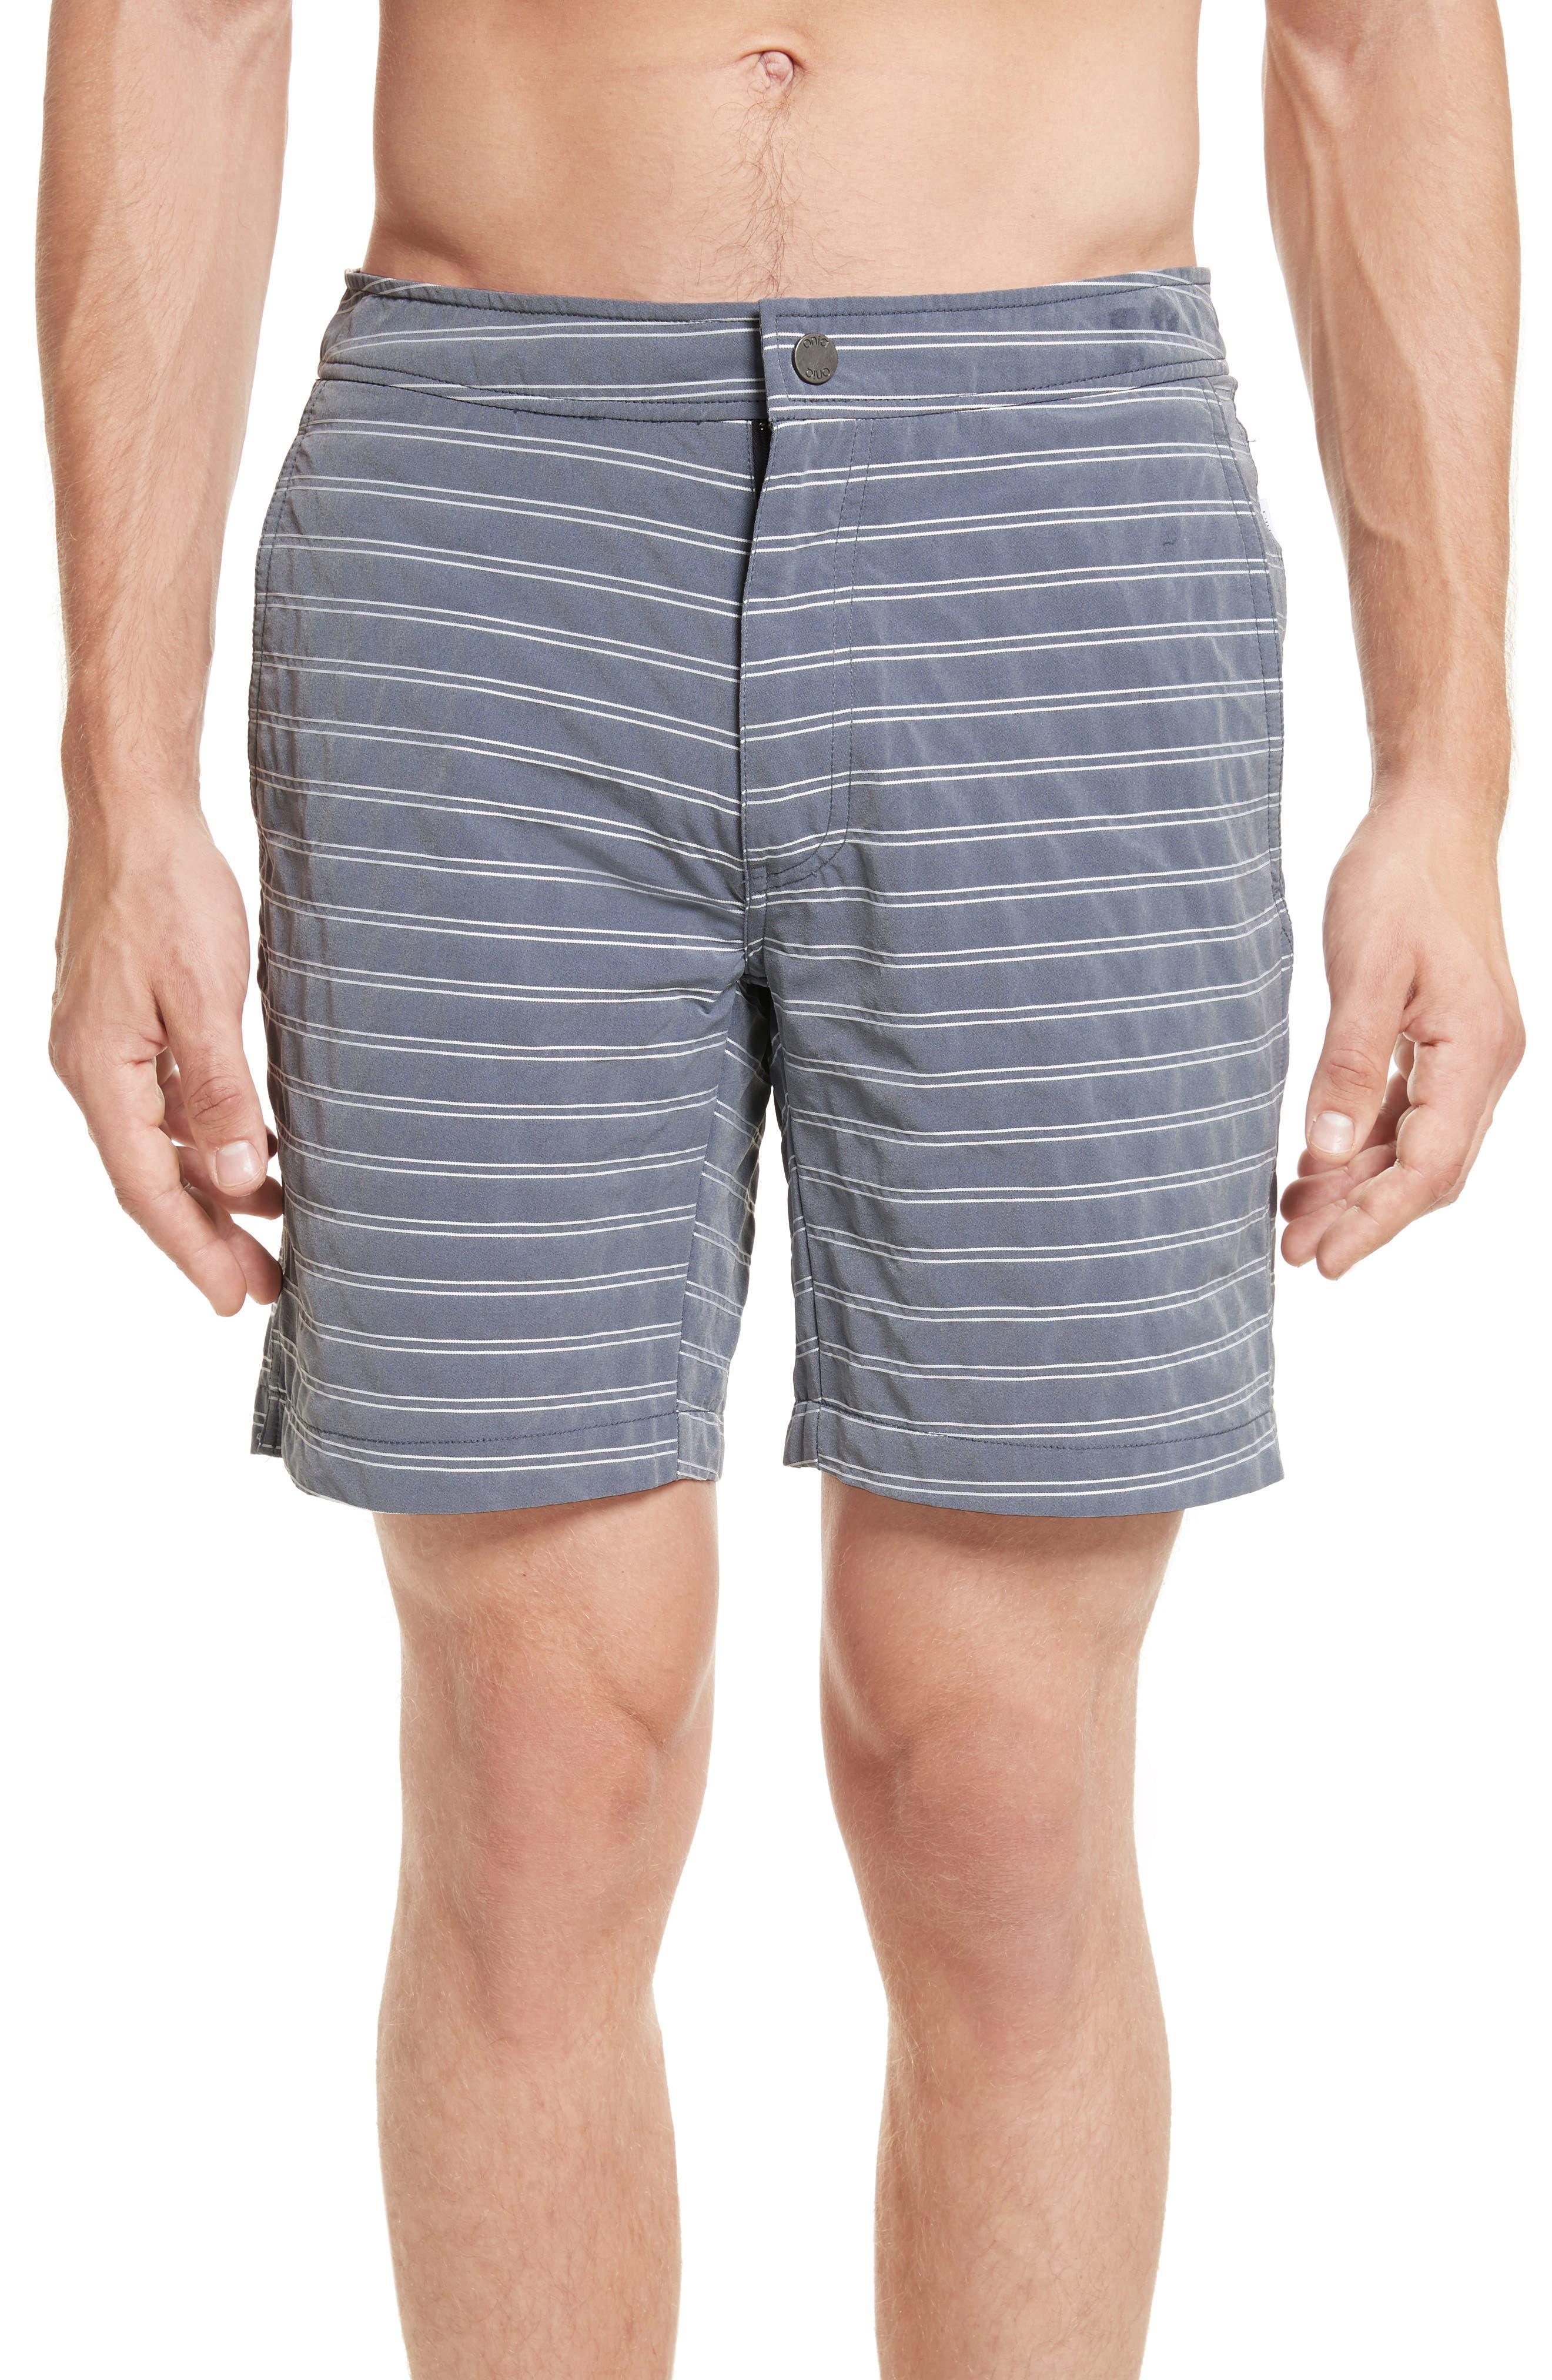 Main Image - ONIA Calder Stripe Board Shorts